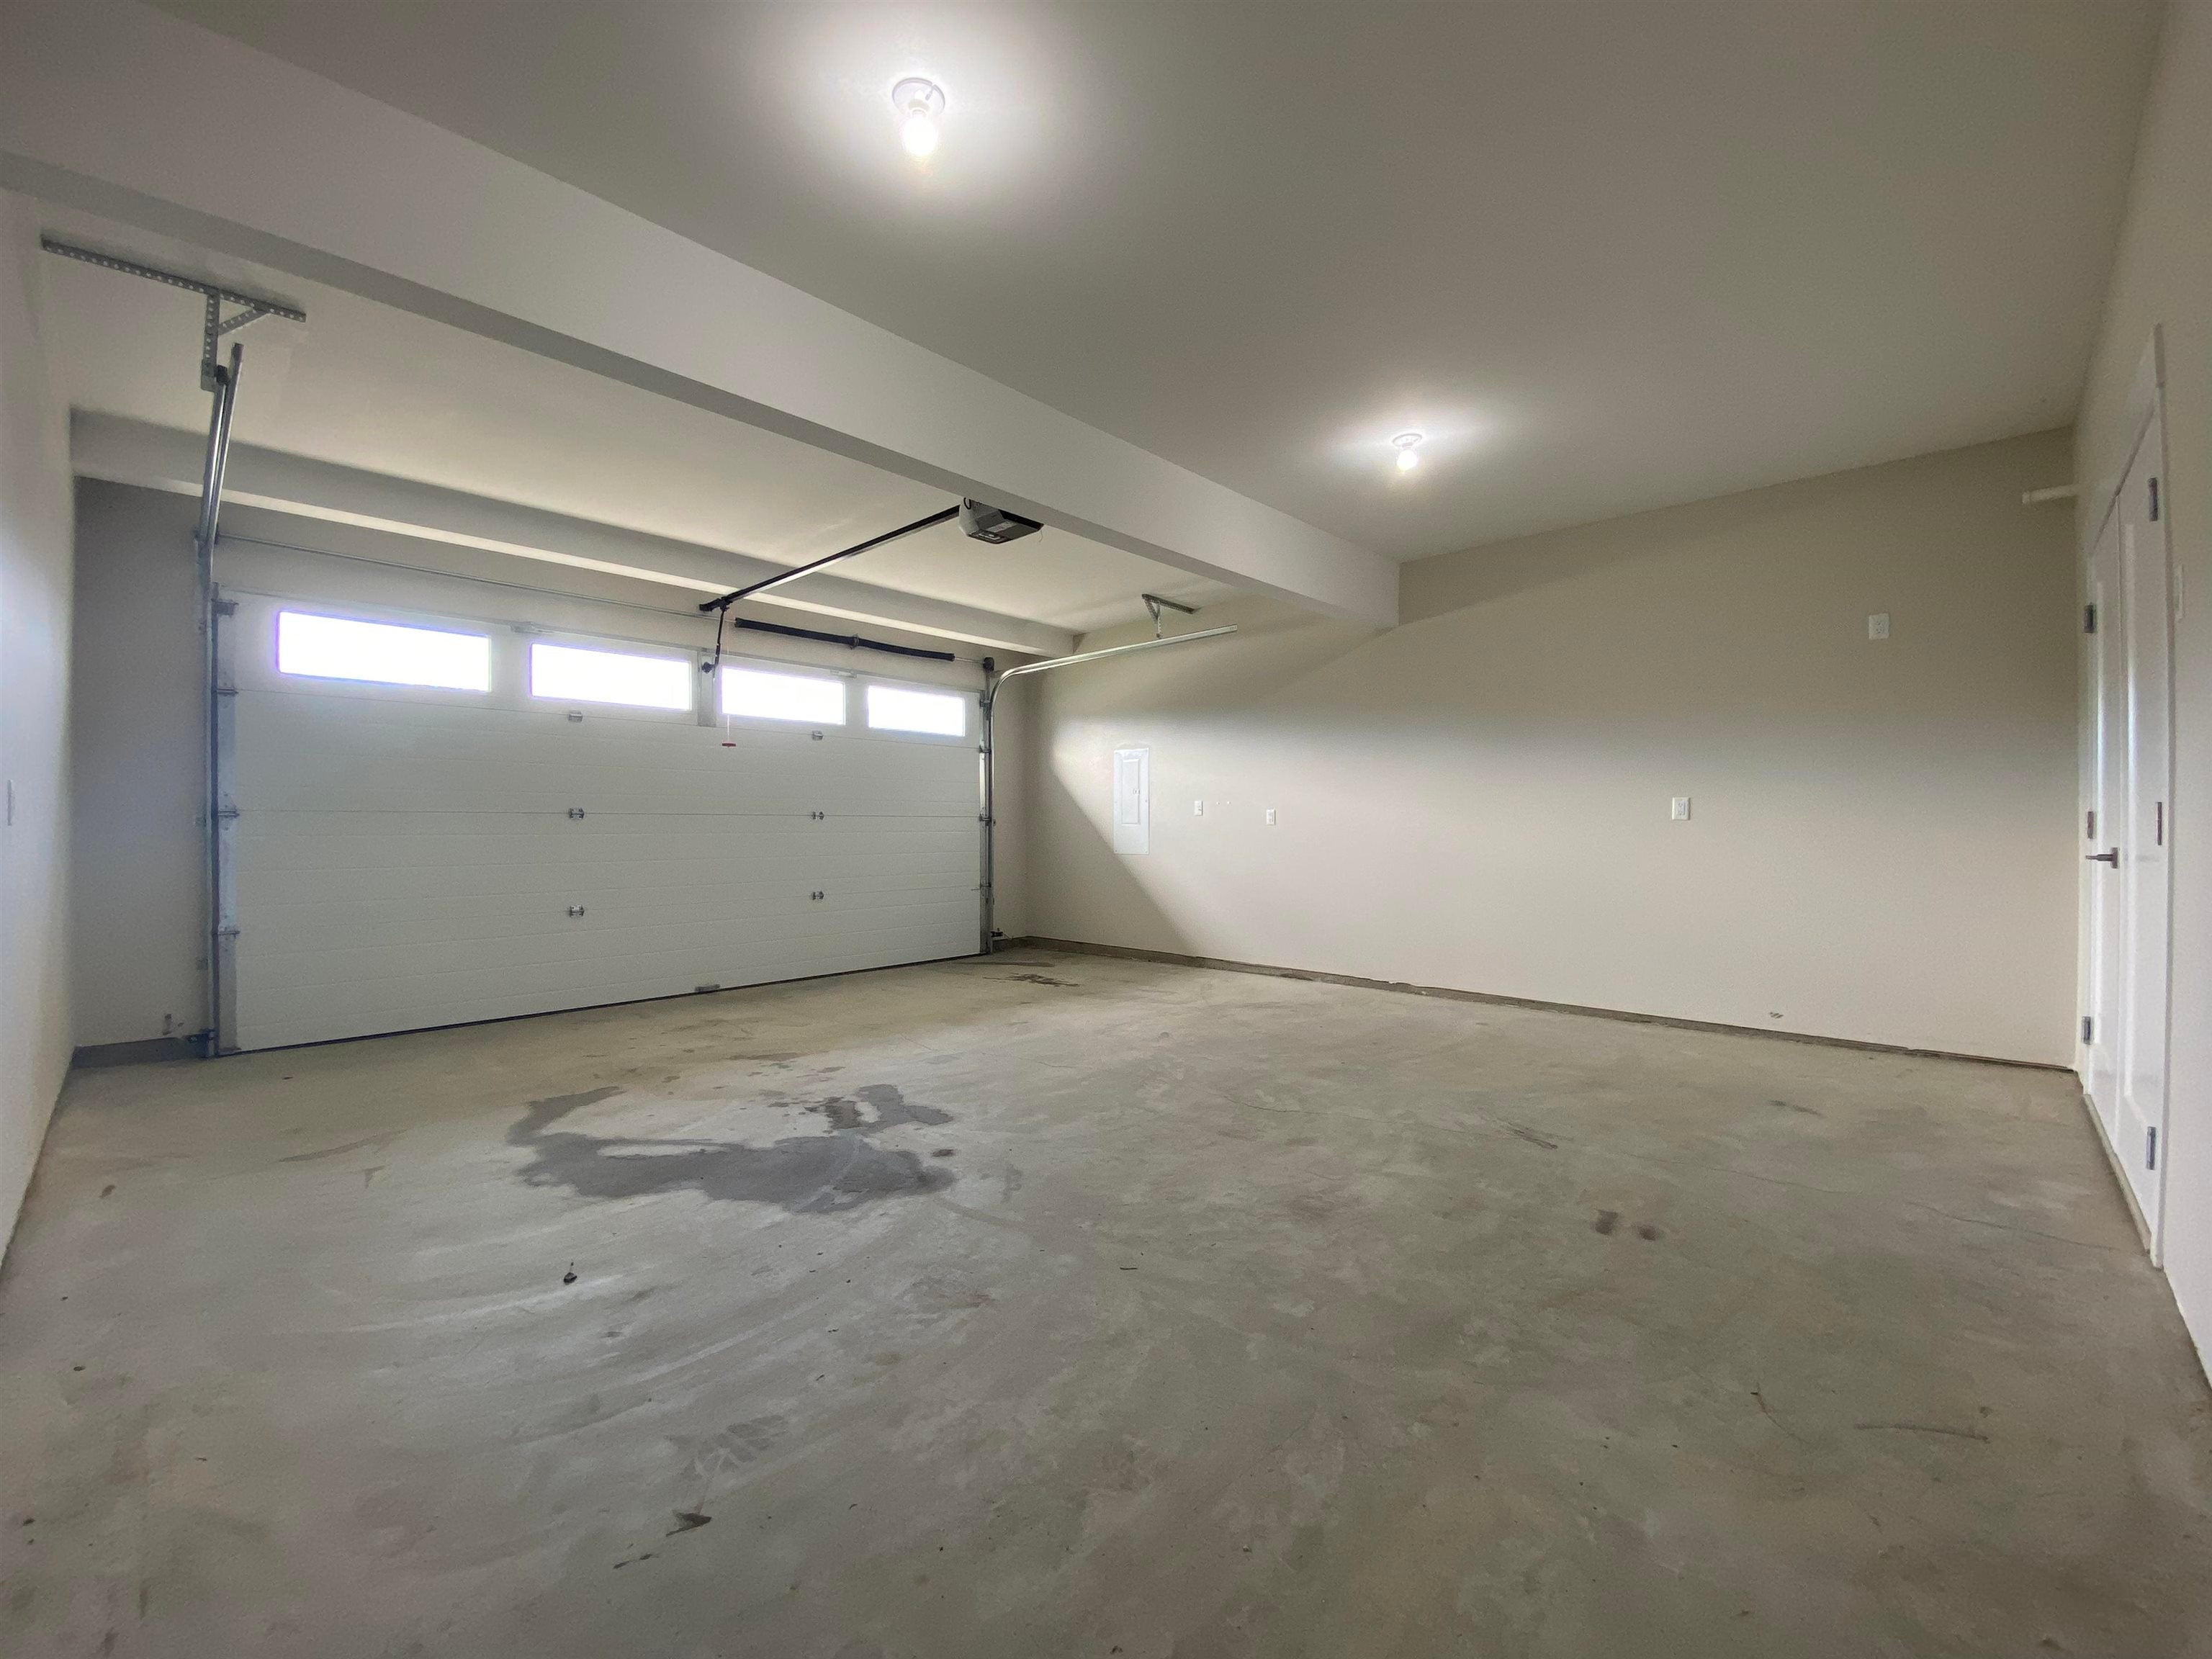 10144 KILLARNEY DRIVE - Fairfield Island House/Single Family for sale, 5 Bedrooms (R2625716) - #9